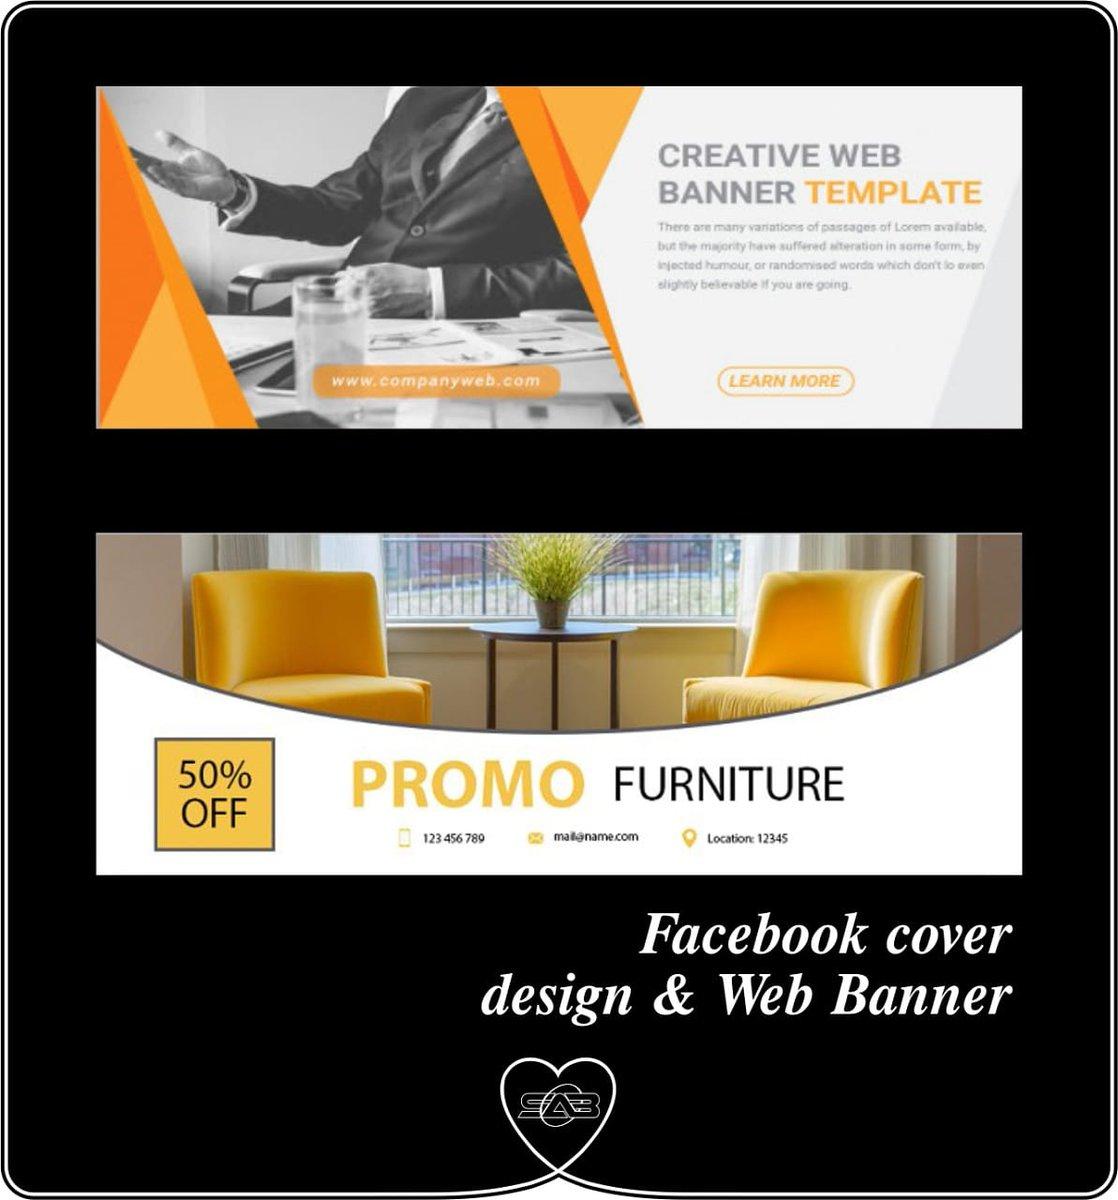 #design #designer #designinspiration #designinspo #graphicdesign #graphicdesigner #logomaker #printmaking #prints #publishing #publicity #visitingcards #brochures #catalogue #flyers #stationery #letterhead #facebook #facebookcover #webbanner #webbannerdesignerpic.twitter.com/RvjfJ5SqRs